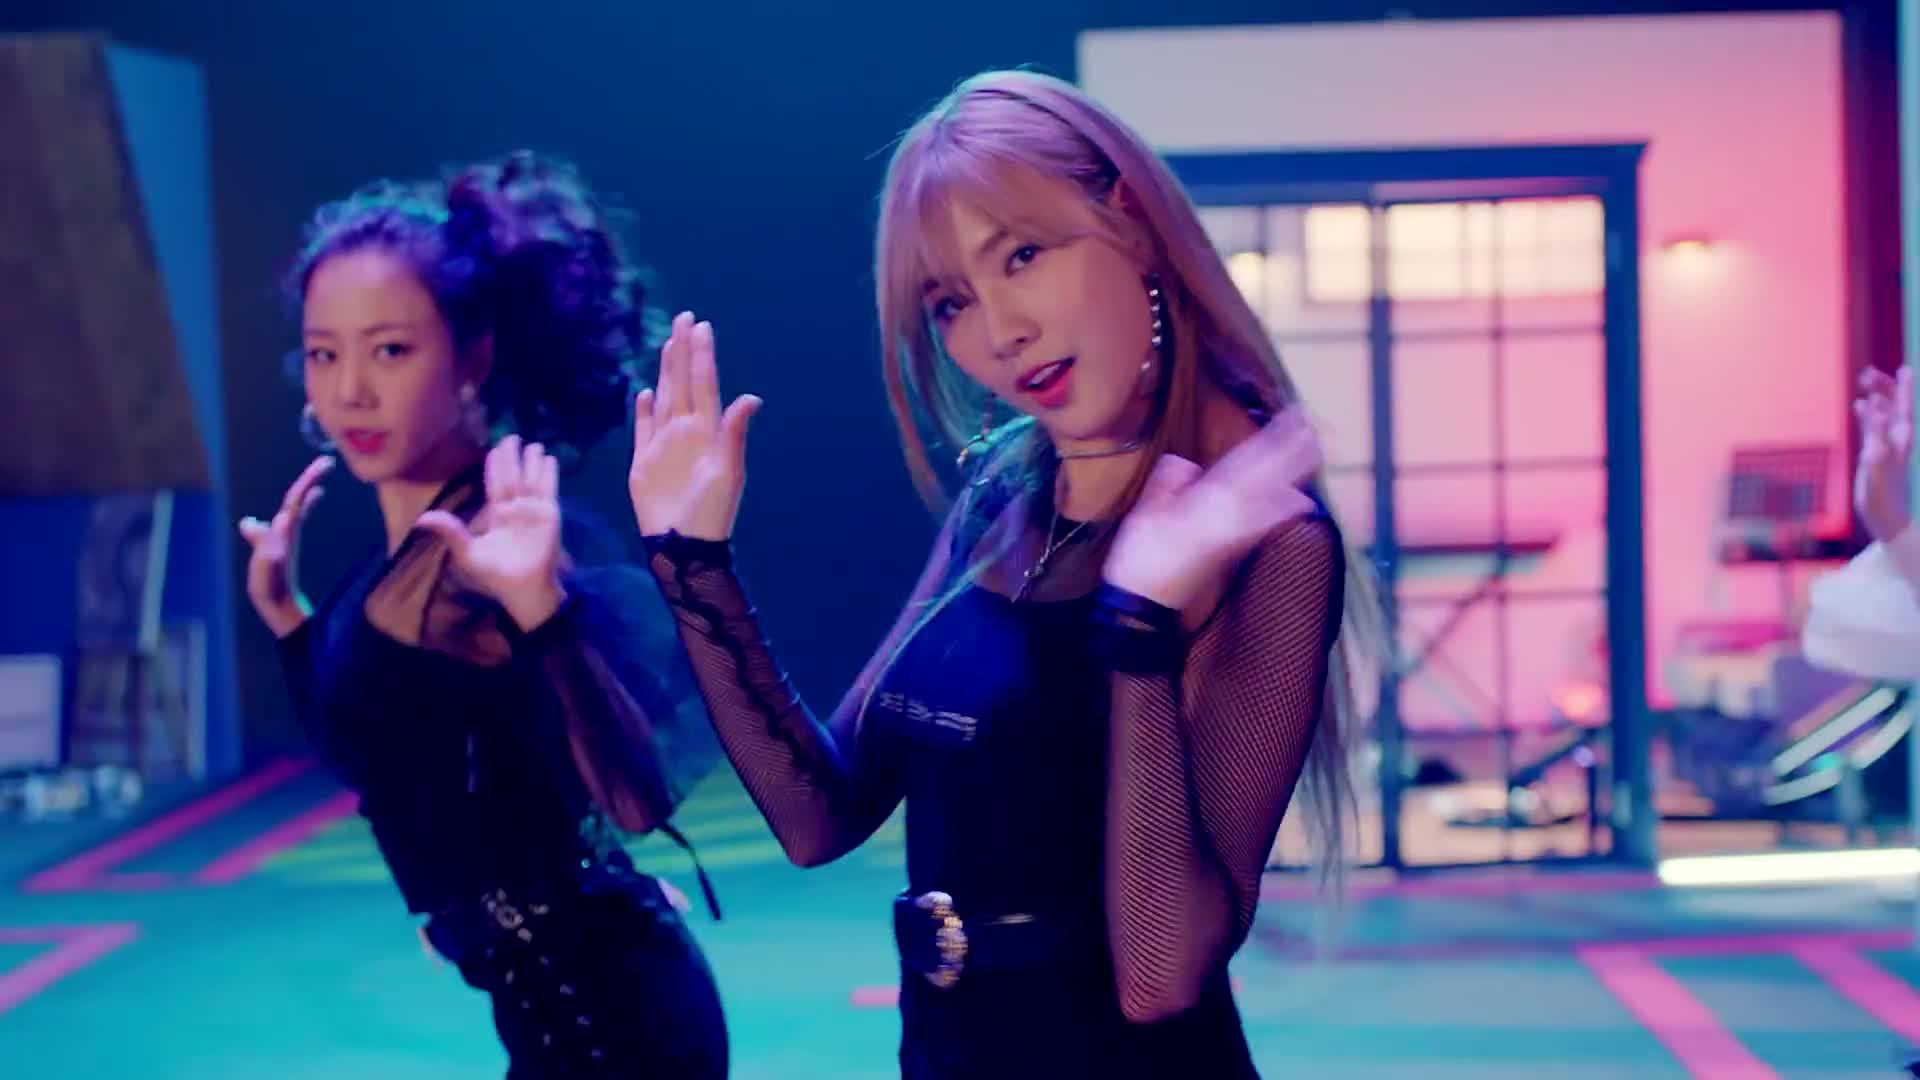 1theK, Kpop, MV, Teaser, loen, 로엔, 뮤비, 신곡, 원더케이, 티져, [MV] Apink(에이핑크) _ I'm so sick(1도 없어) GIFs